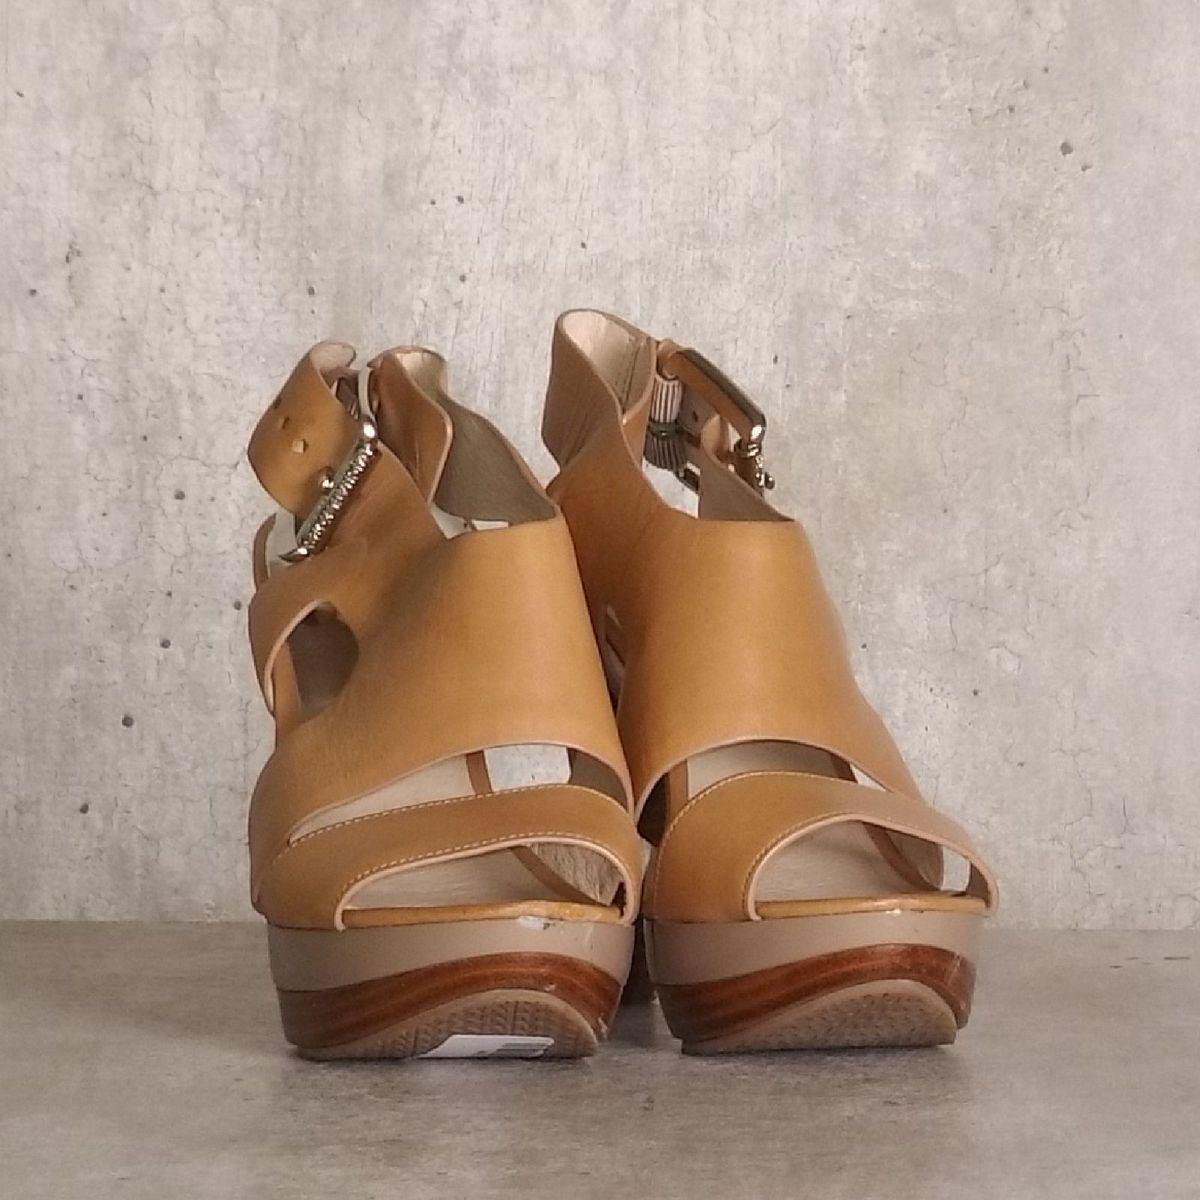 sandália meia pata caramelo michael - sandálias michael kors